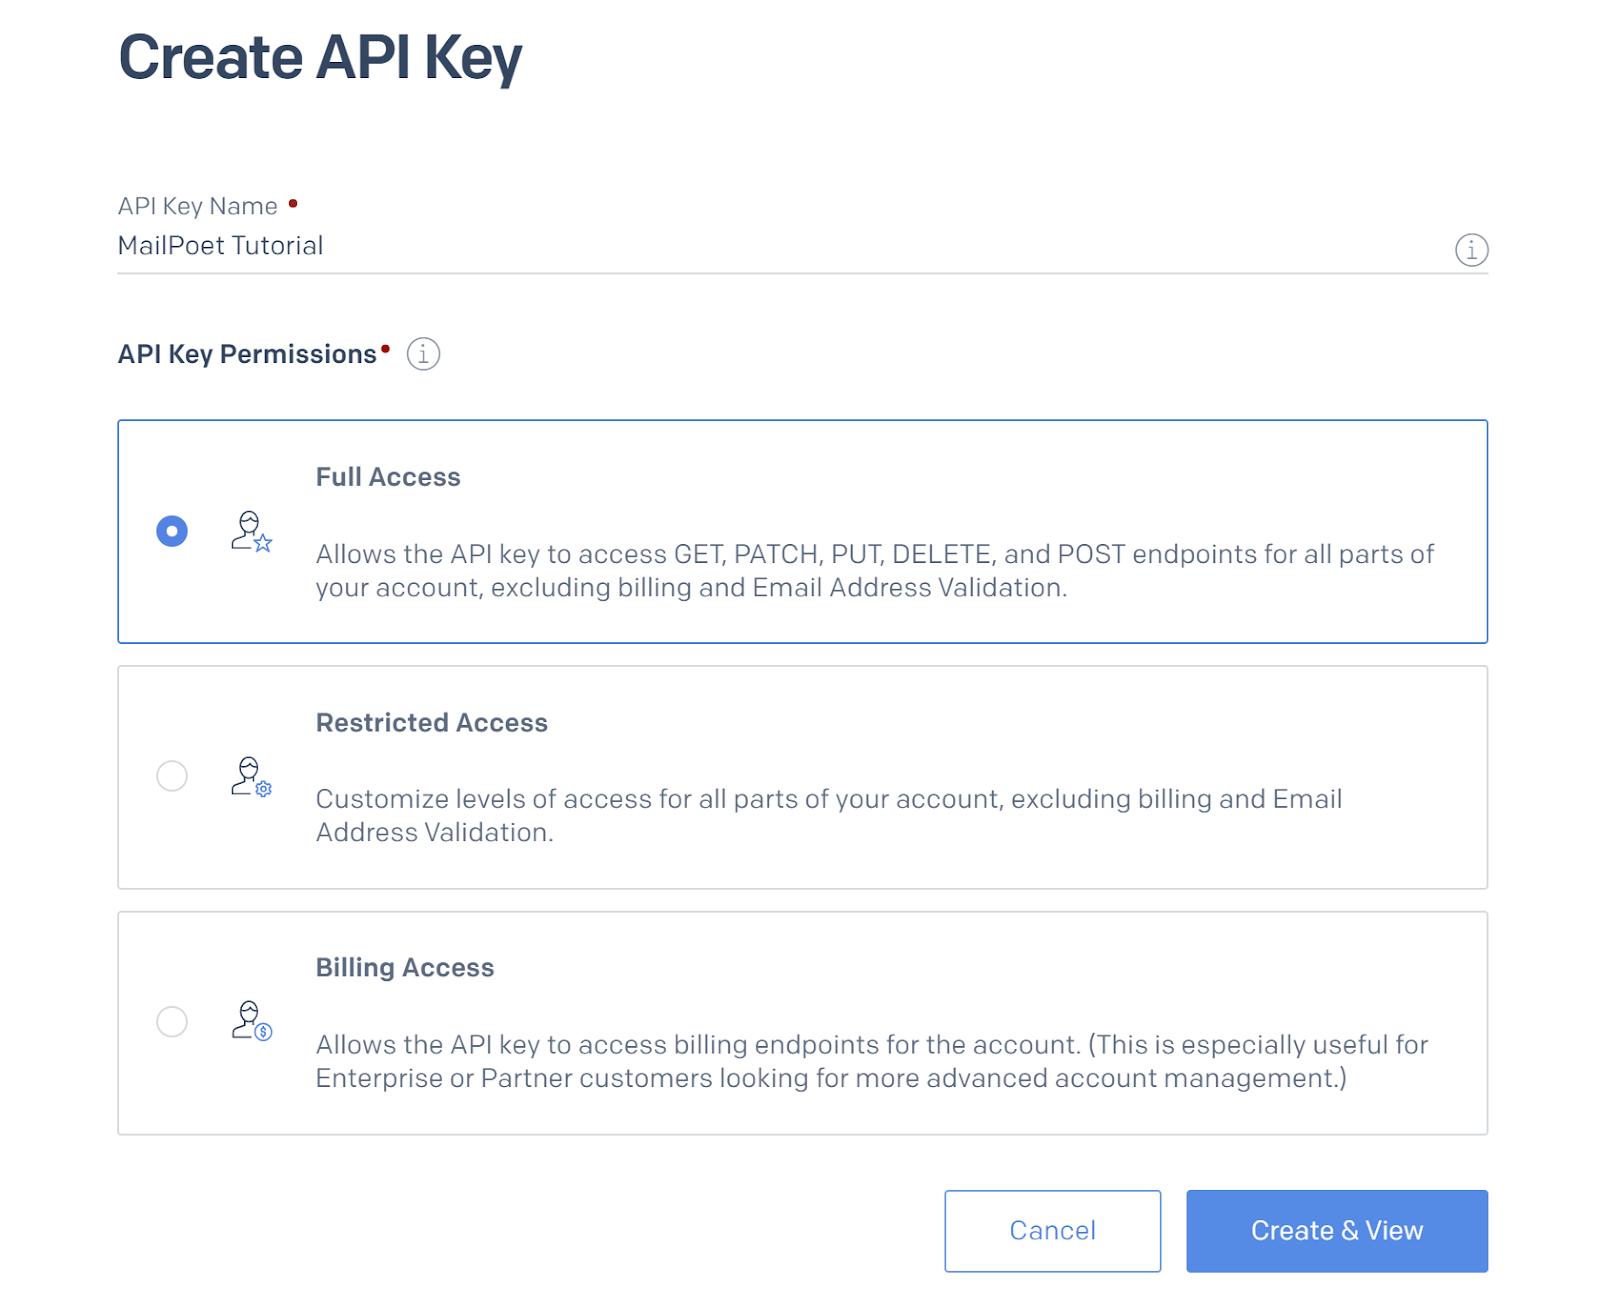 Screenshot of permissions options on SendGrid's Create API Key page